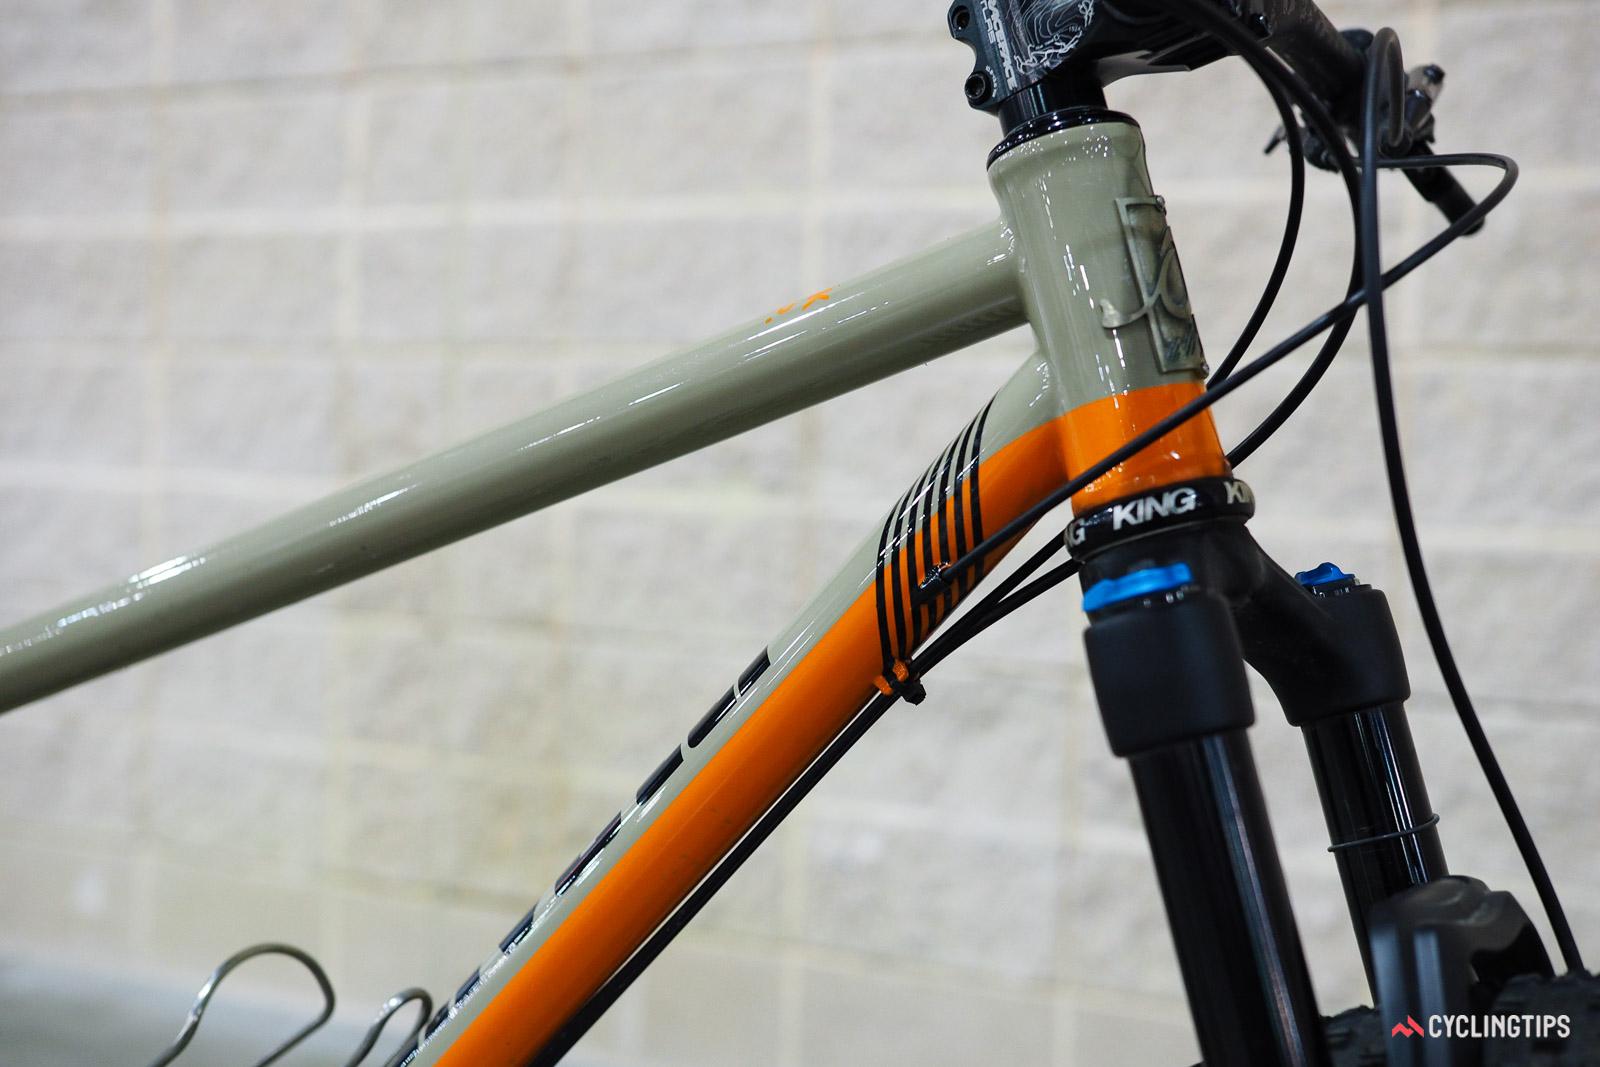 Olivetti-Bicycles-2.jpg